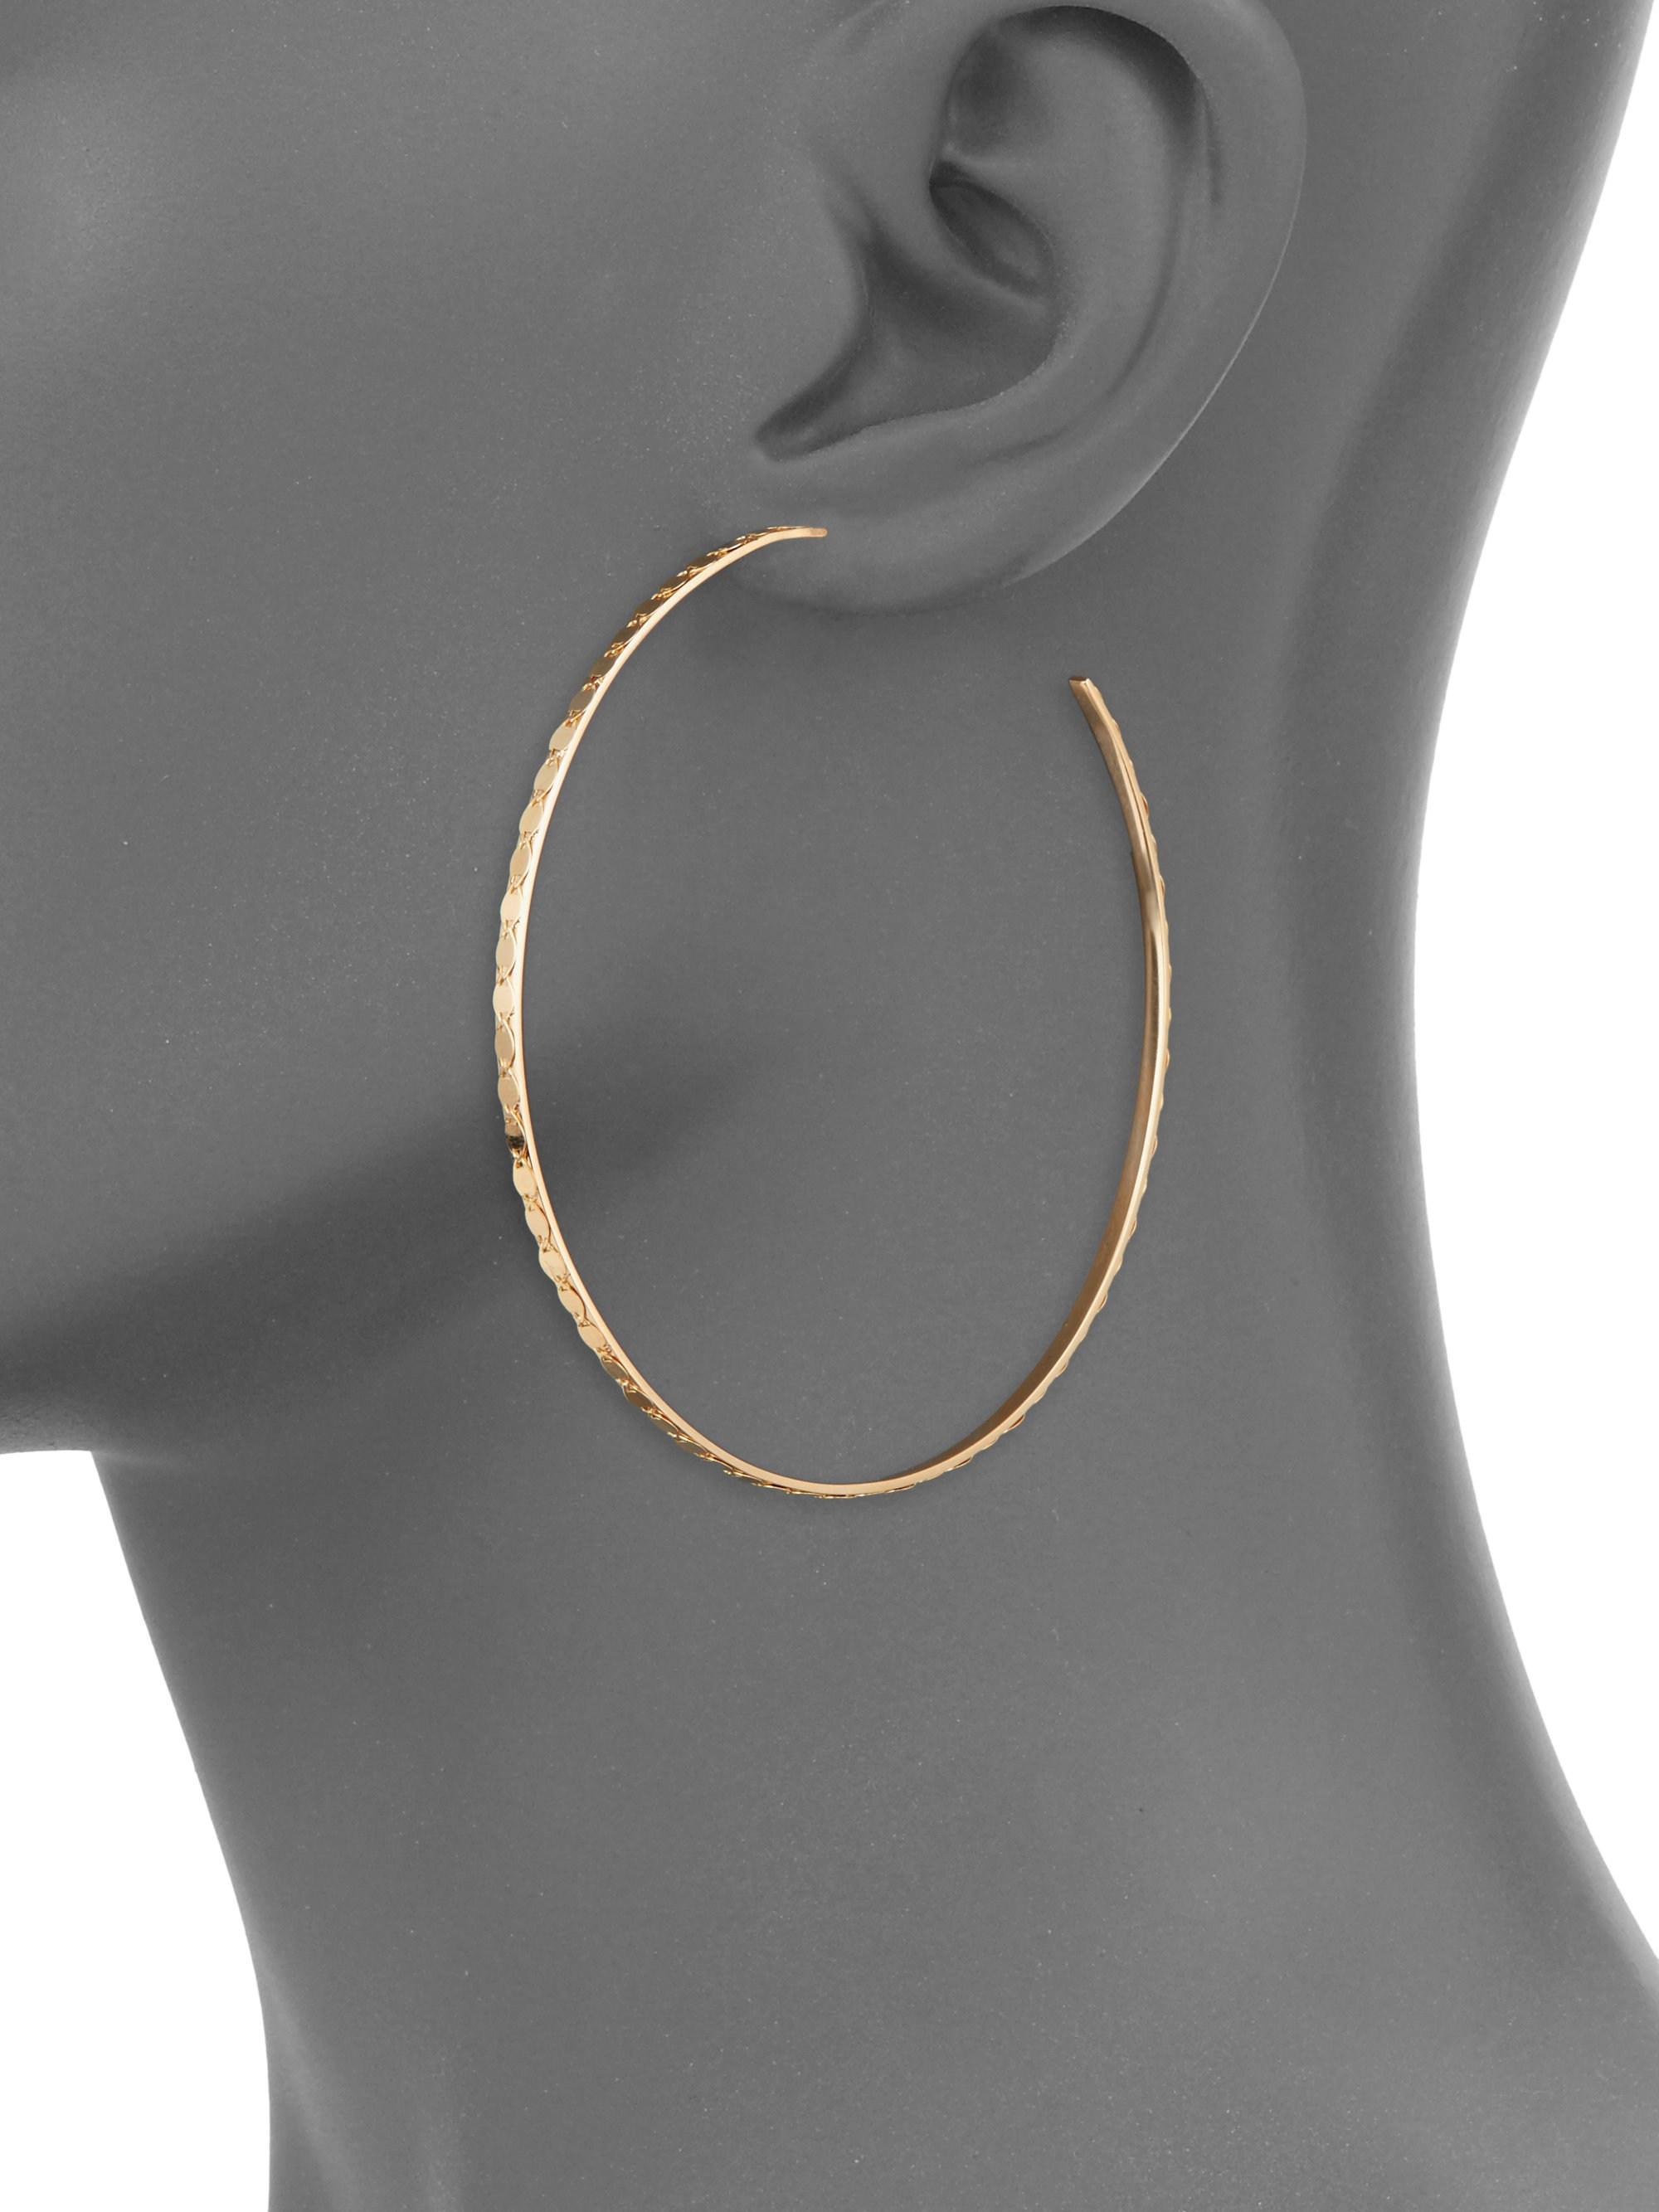 872bbbbe16093 Lyst Lana Jewelry 15 Year Anniversary Small Glam Magic Hoop